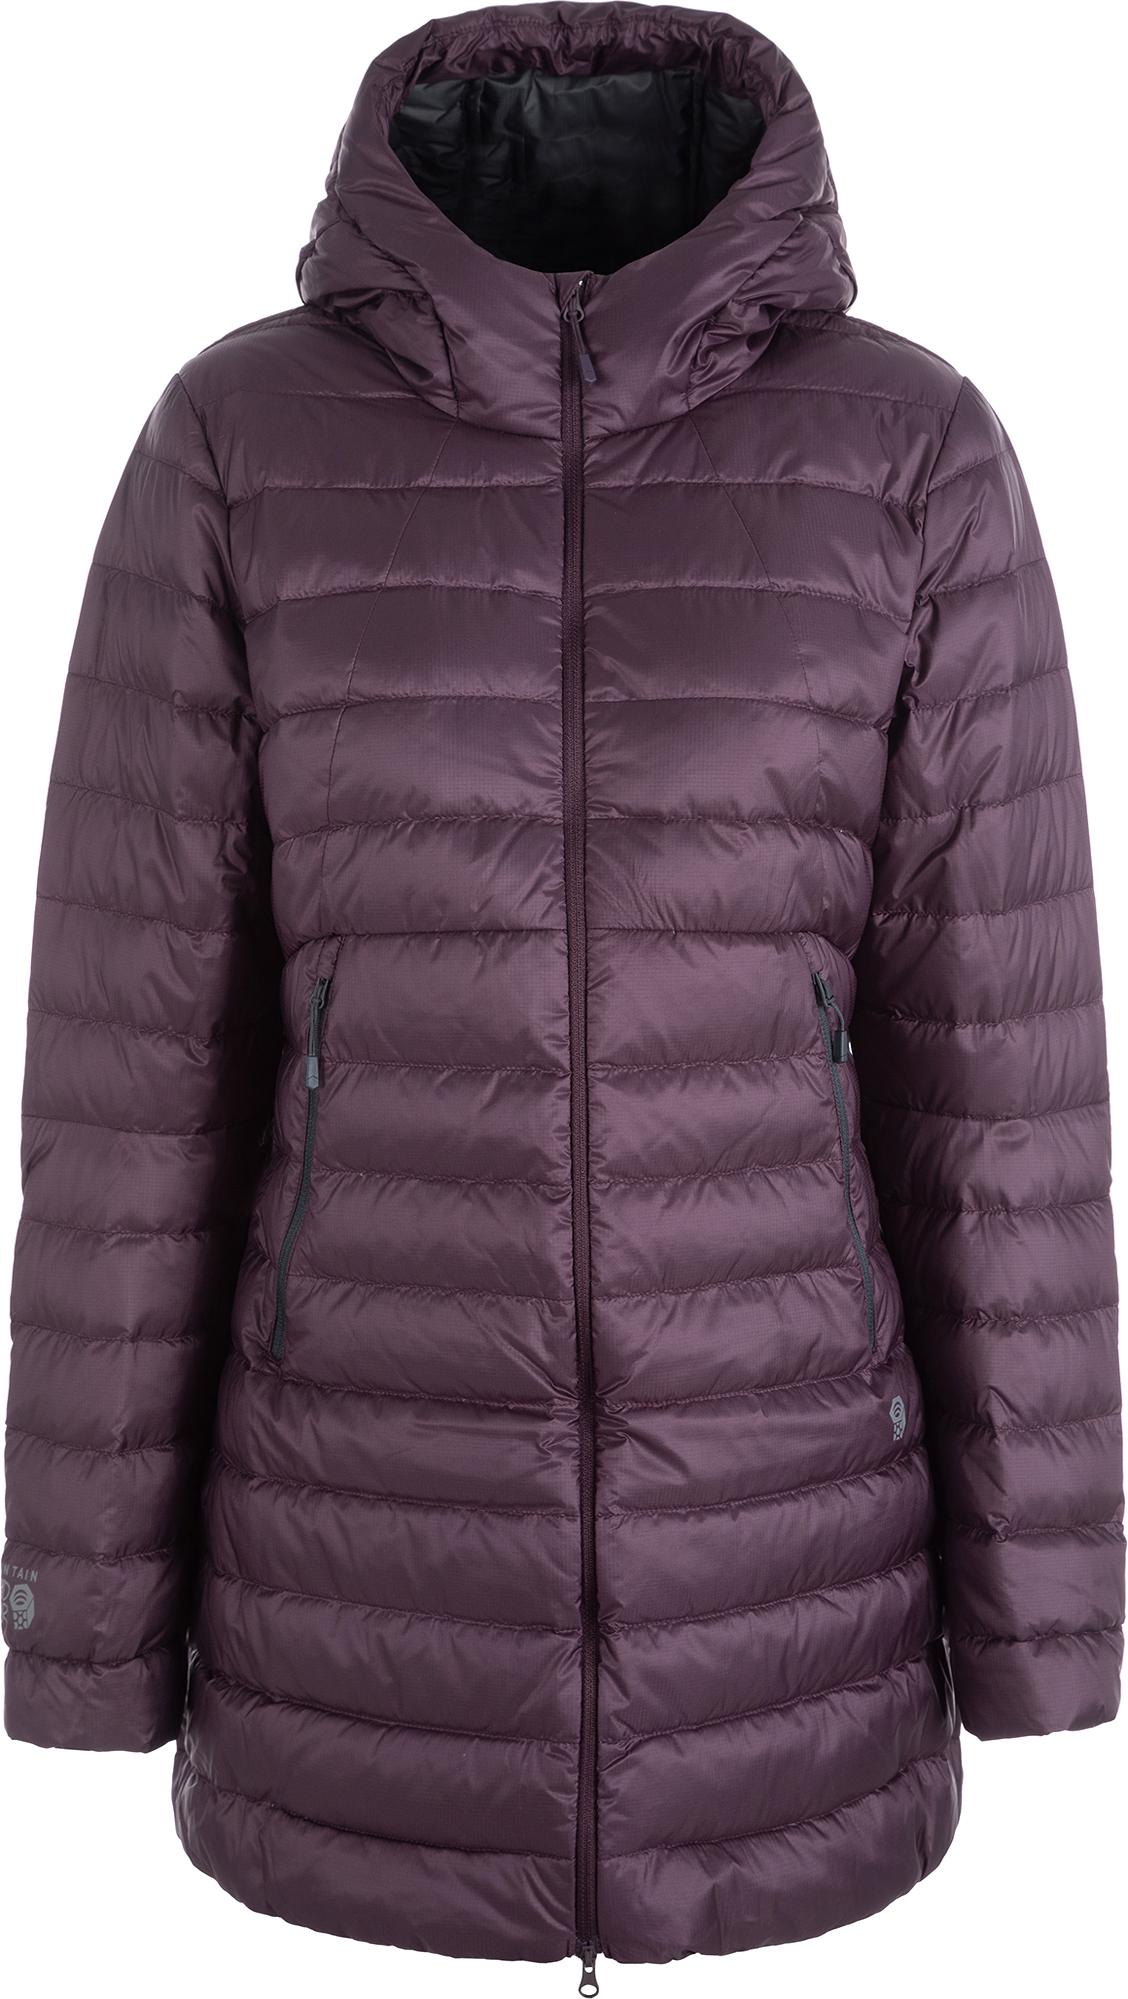 Mountain Hardwear Куртка пуховая женская Mountain Hardwear Rhea Ridge™, размер 50 цена